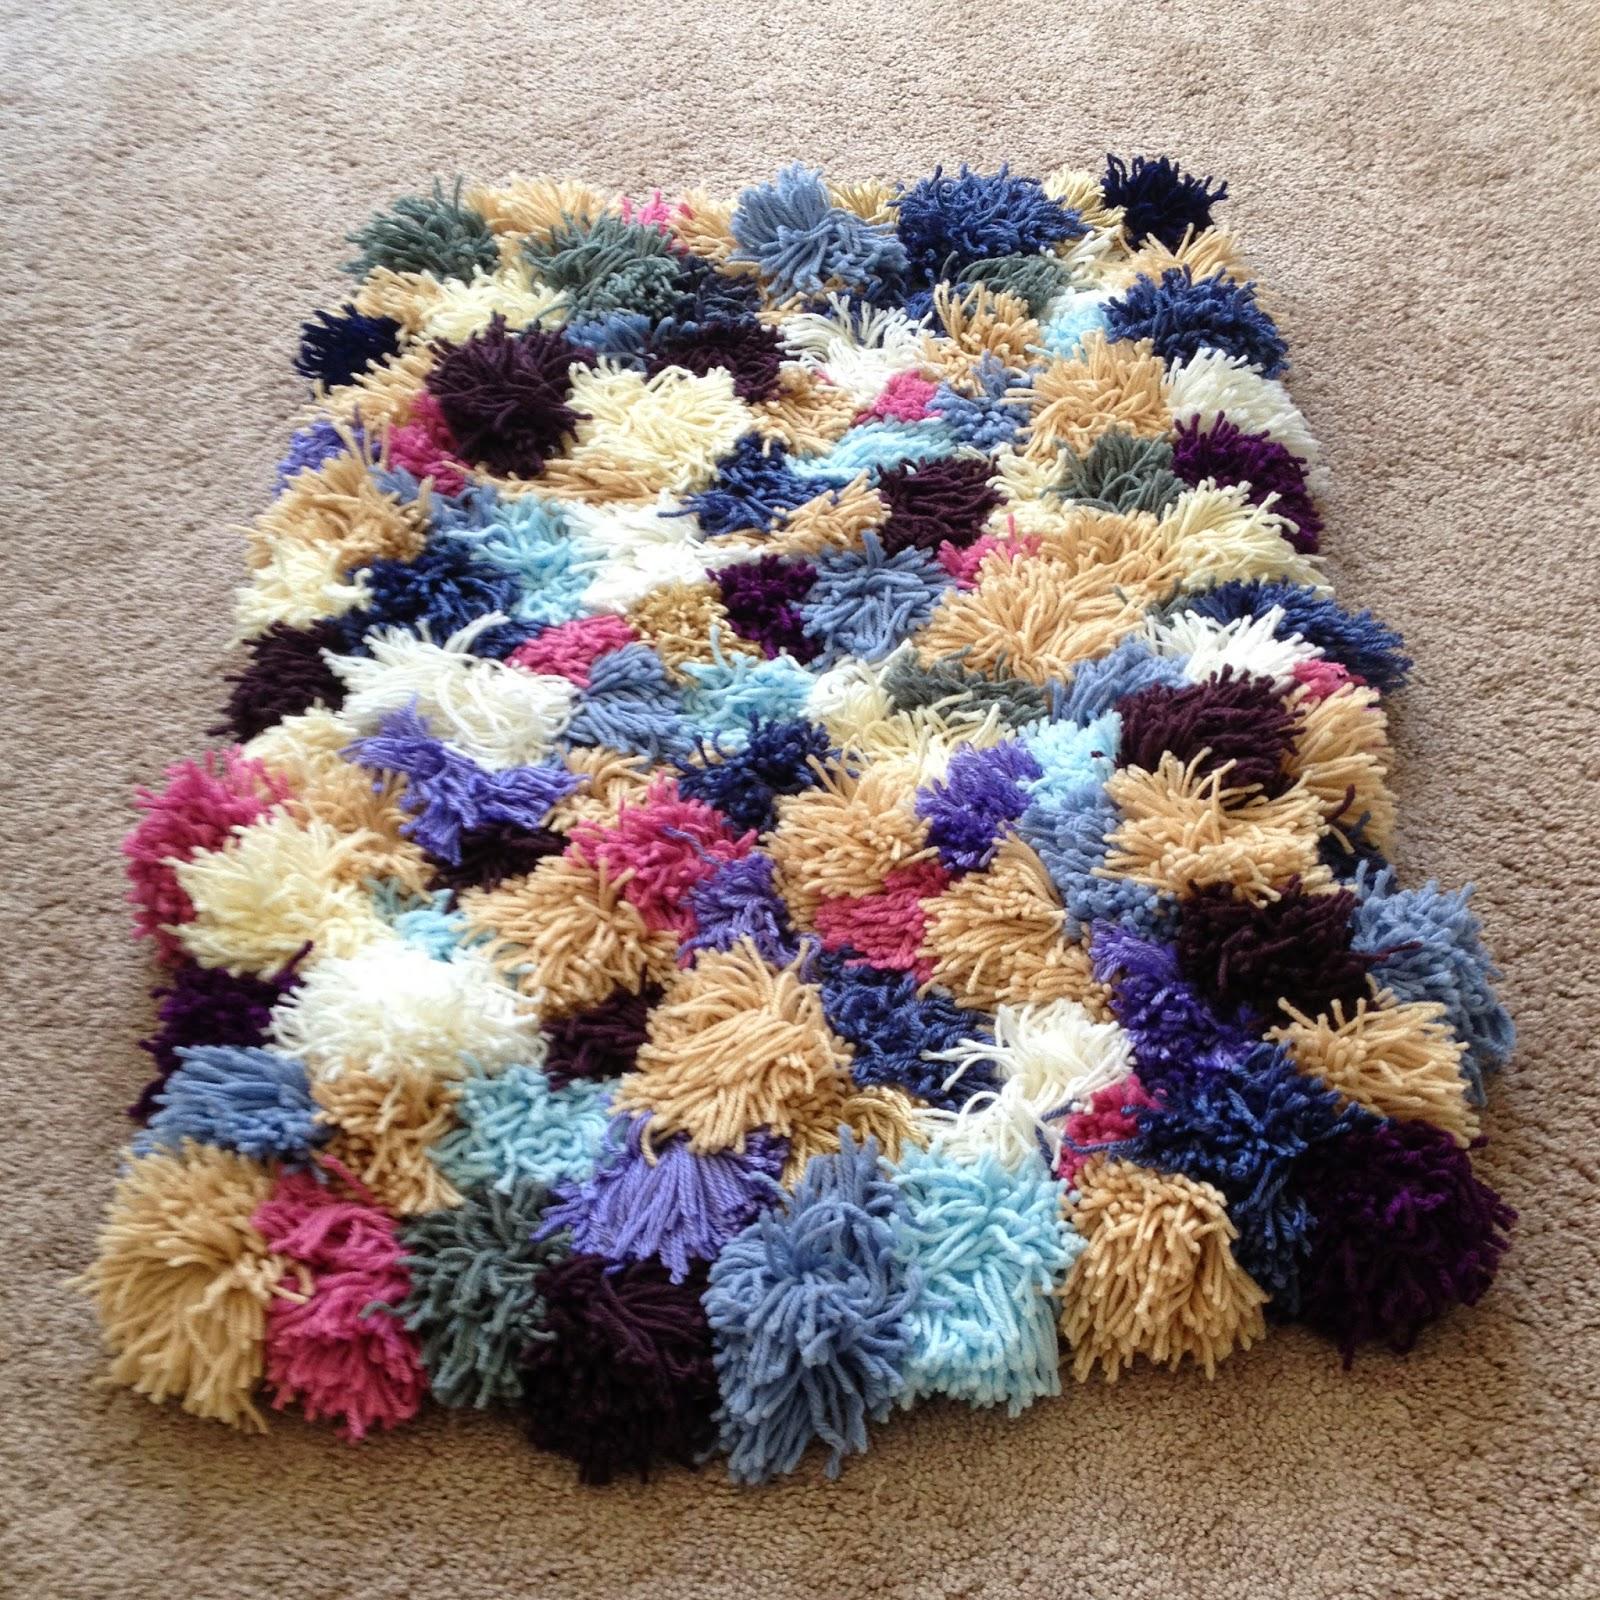 diy yarn rug - Diy Rug